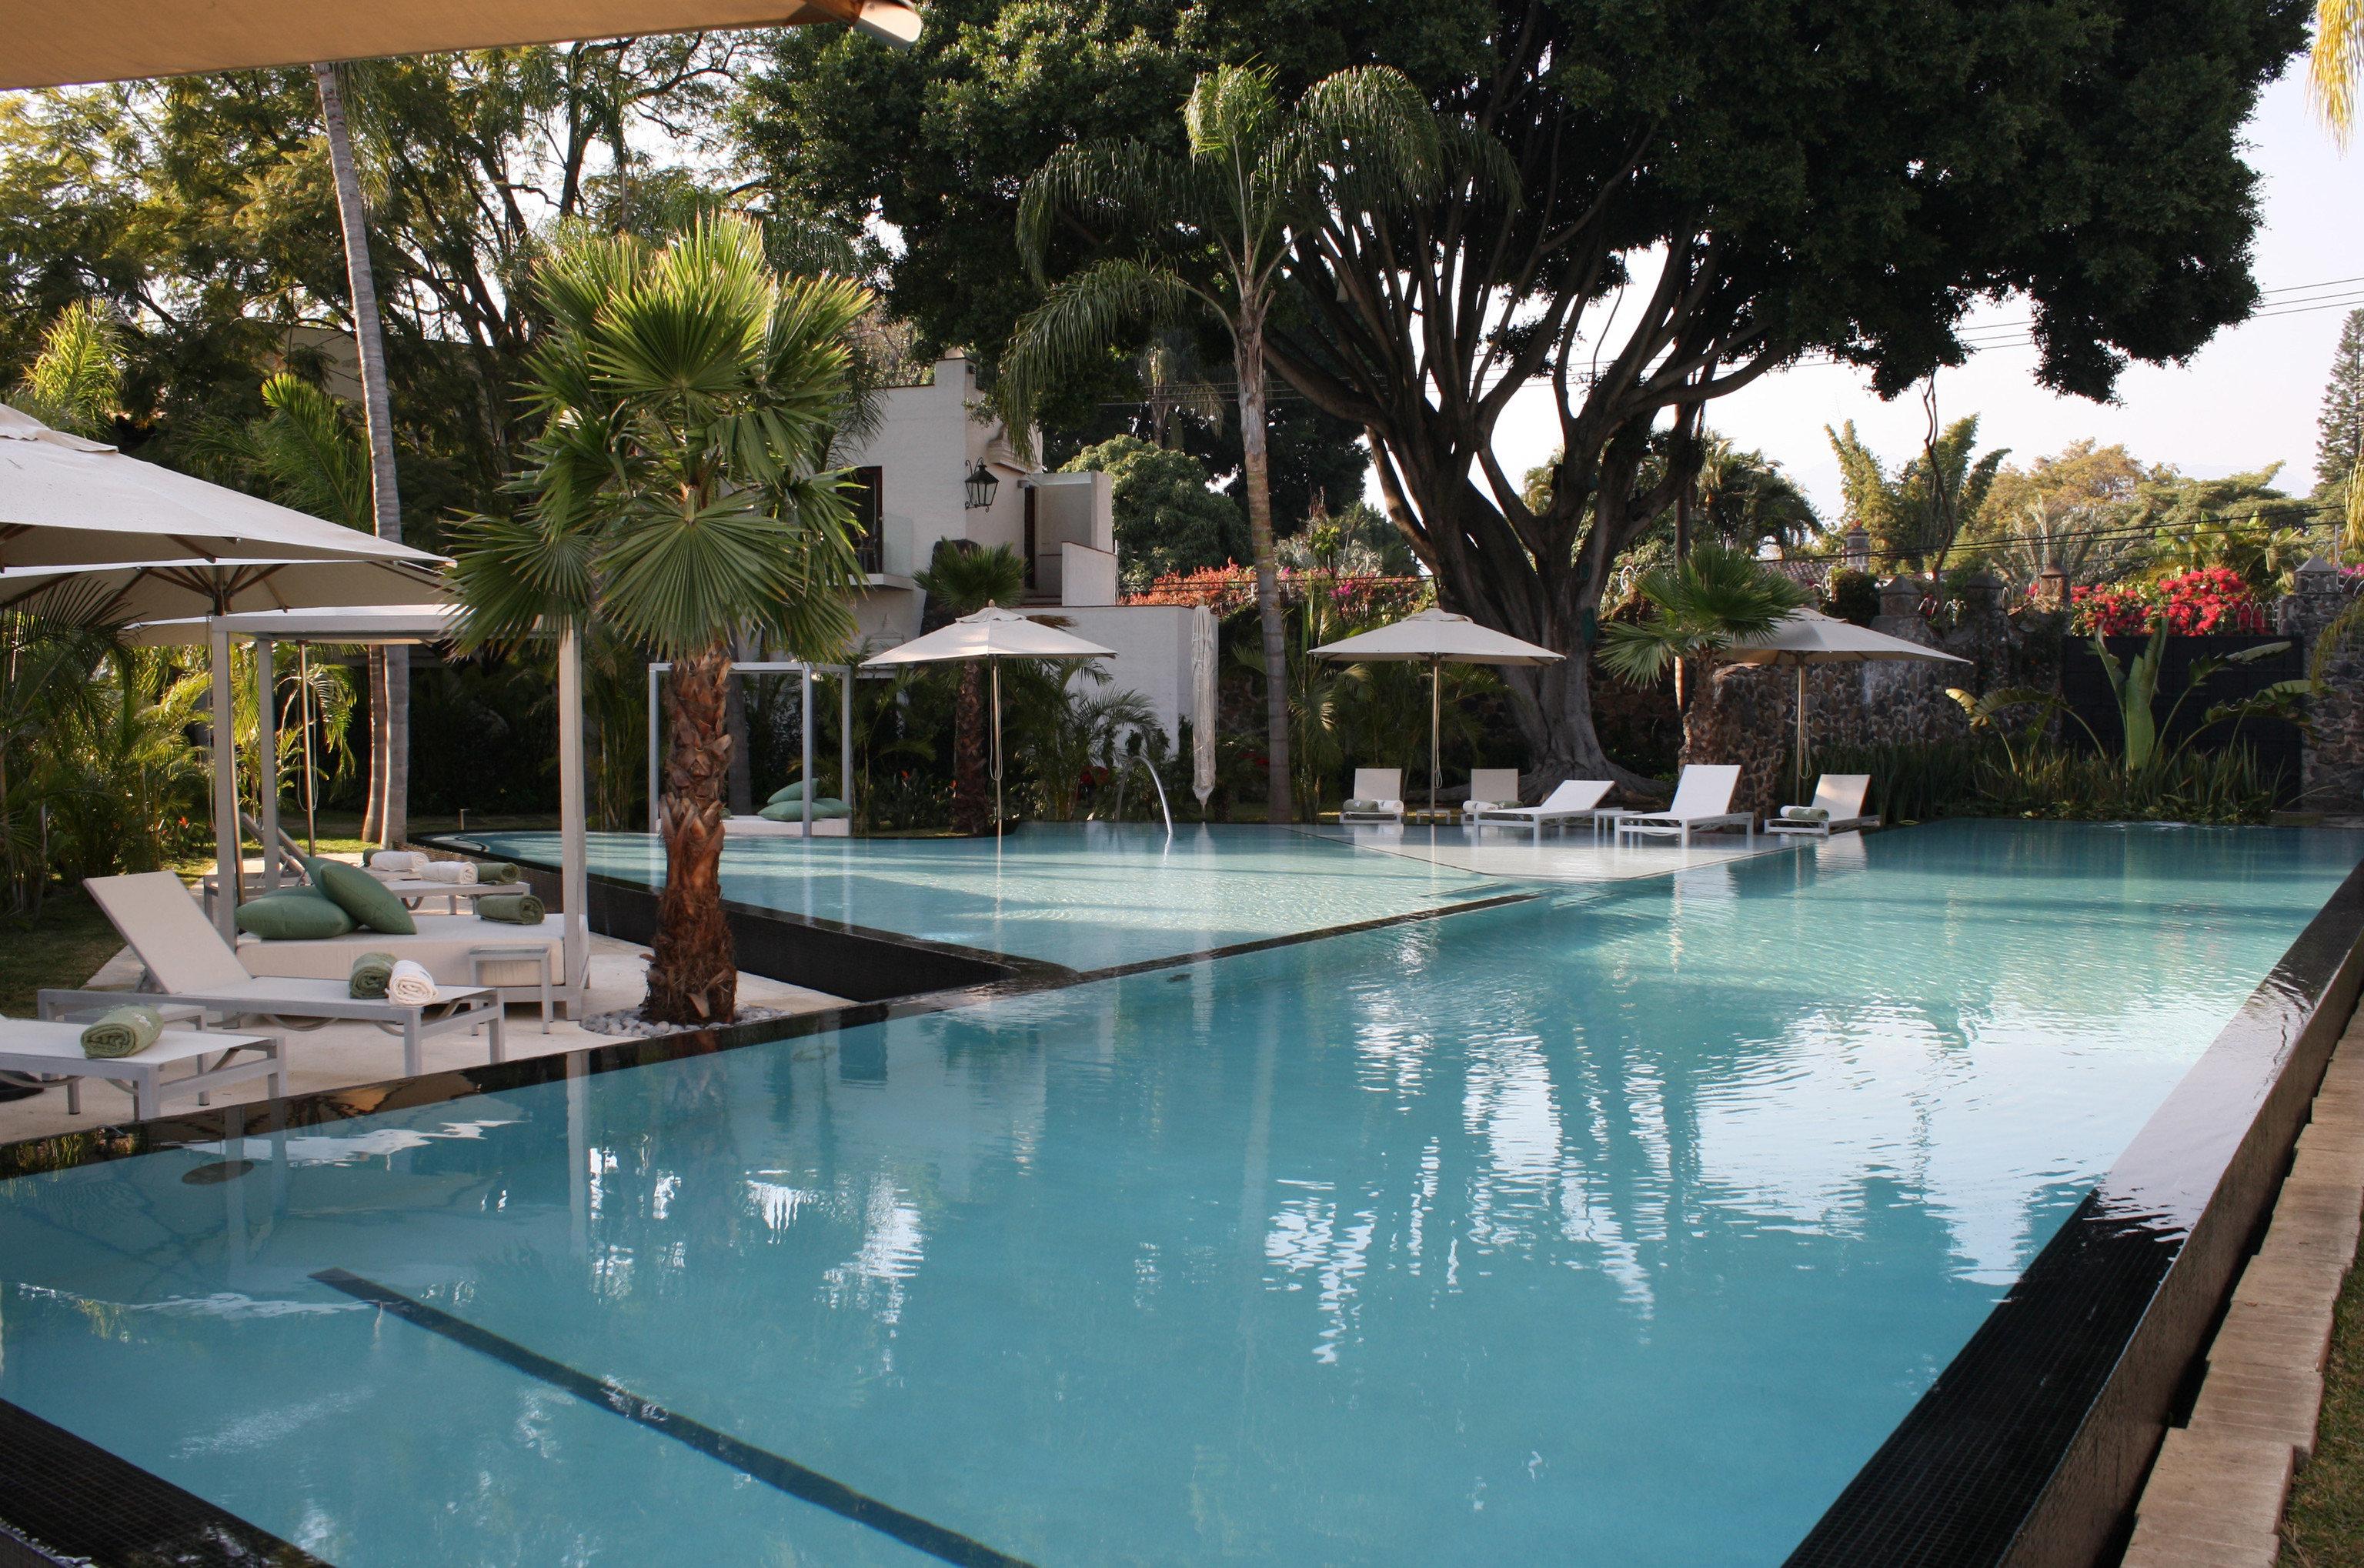 tree swimming pool property leisure Resort Villa backyard condominium Pool